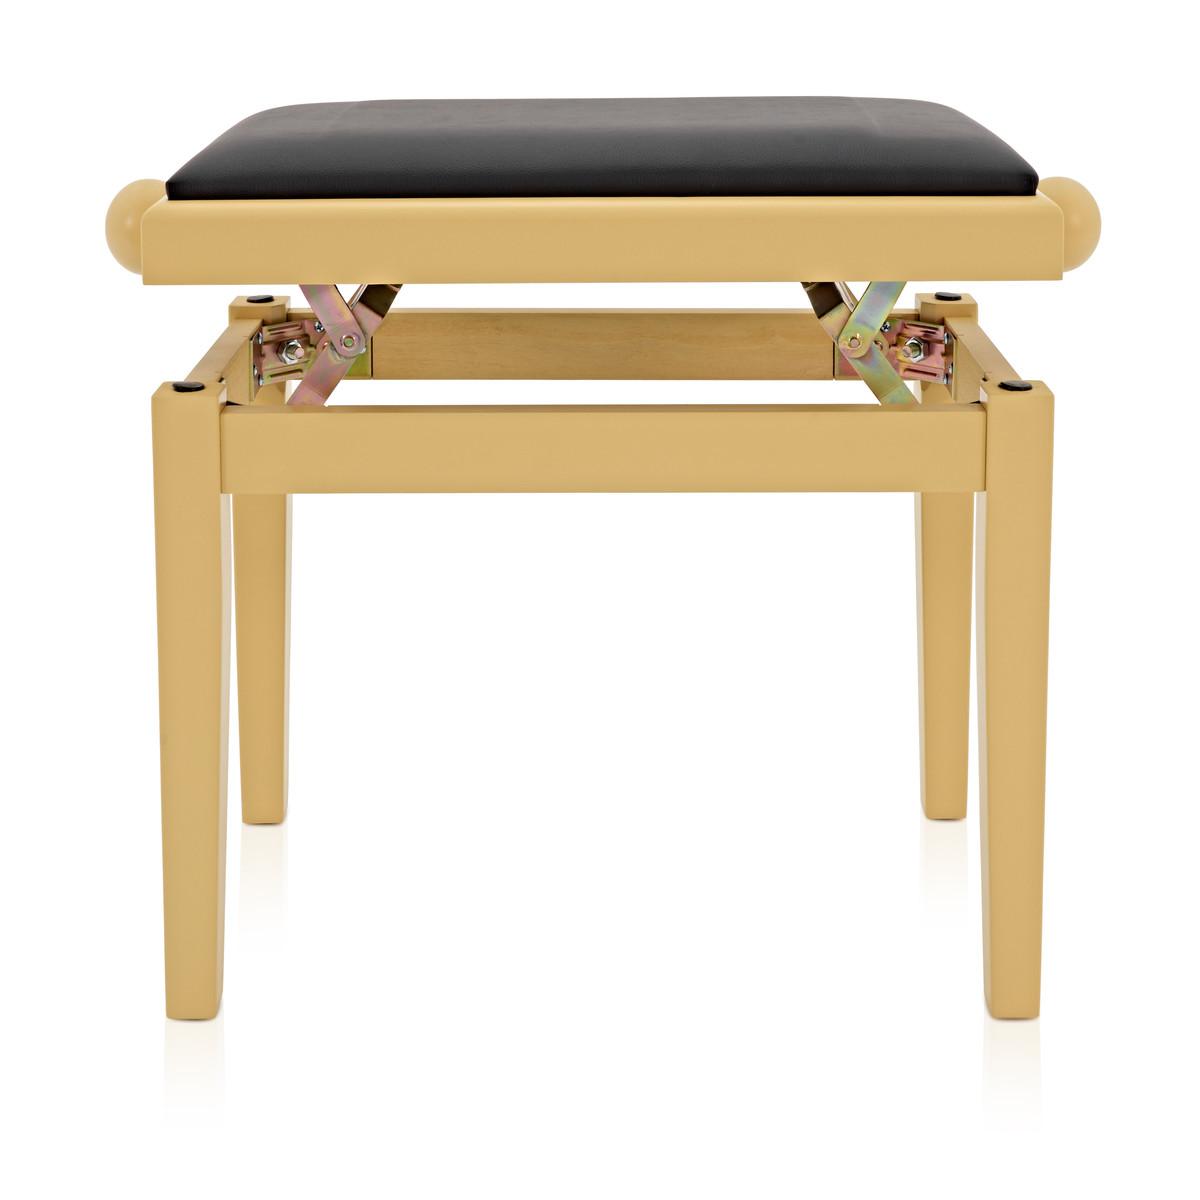 Adjustable Piano Stool By Gear4music Light Cherry Box